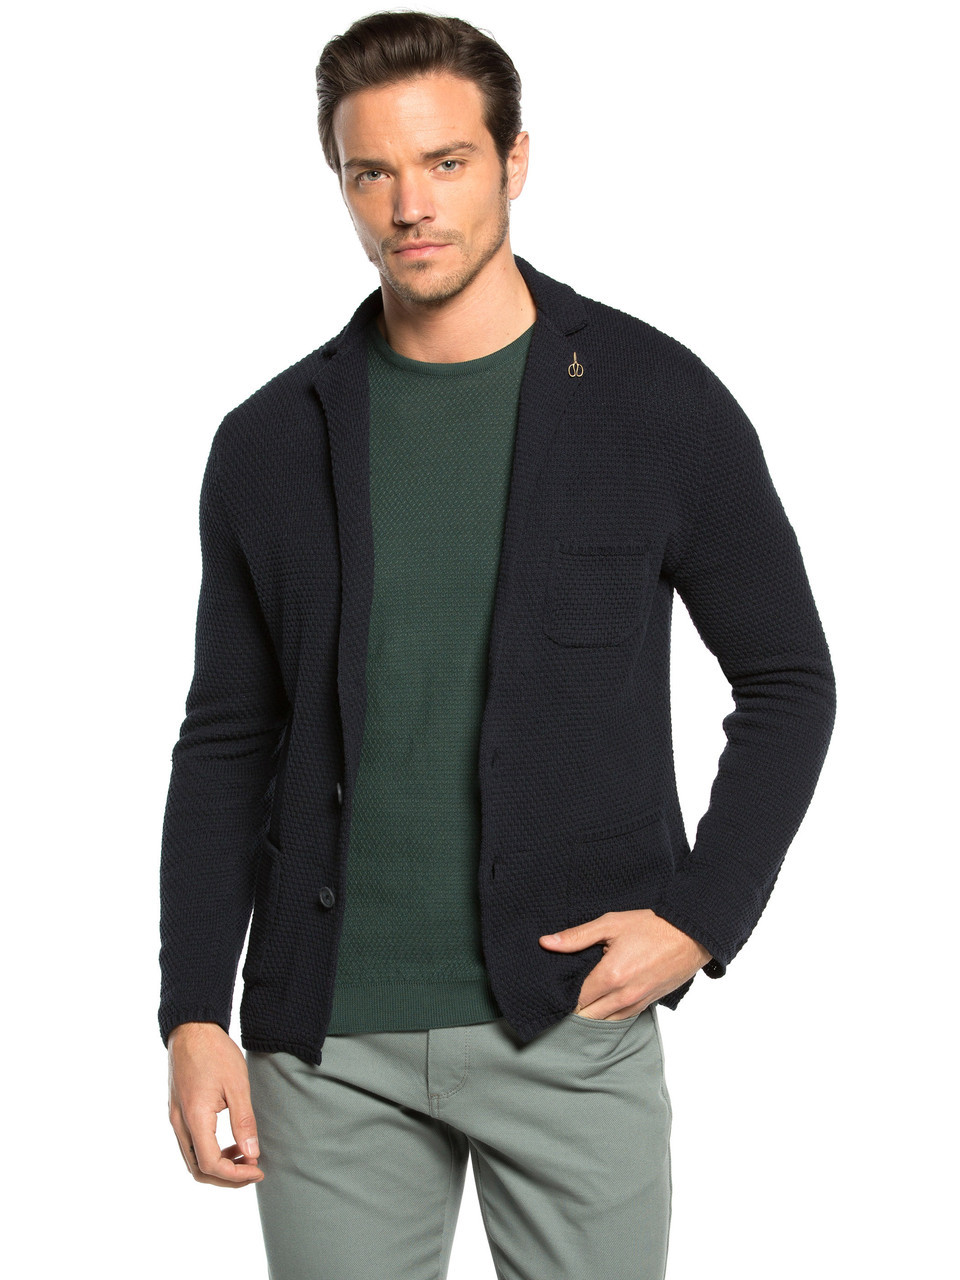 Вязаный мужской пиджак LC Waikiki / ЛС Вайкики на пуговицах , с карманами